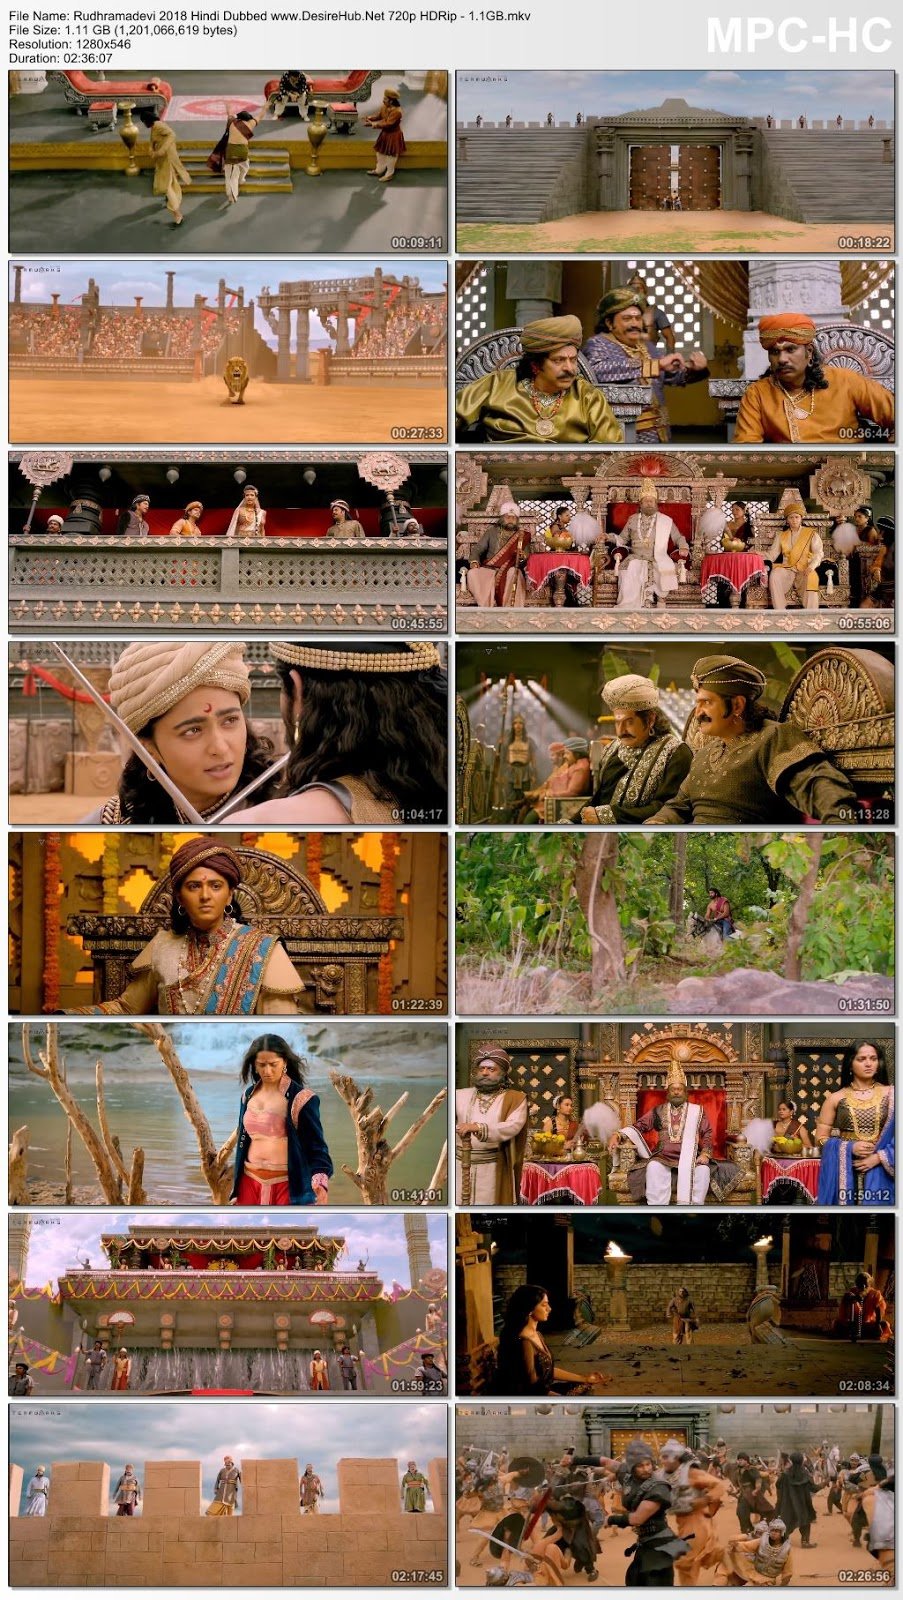 Rudhramadevi (2018) Hindi Dubbed 720p HDRip – 1.1GB Desirehub